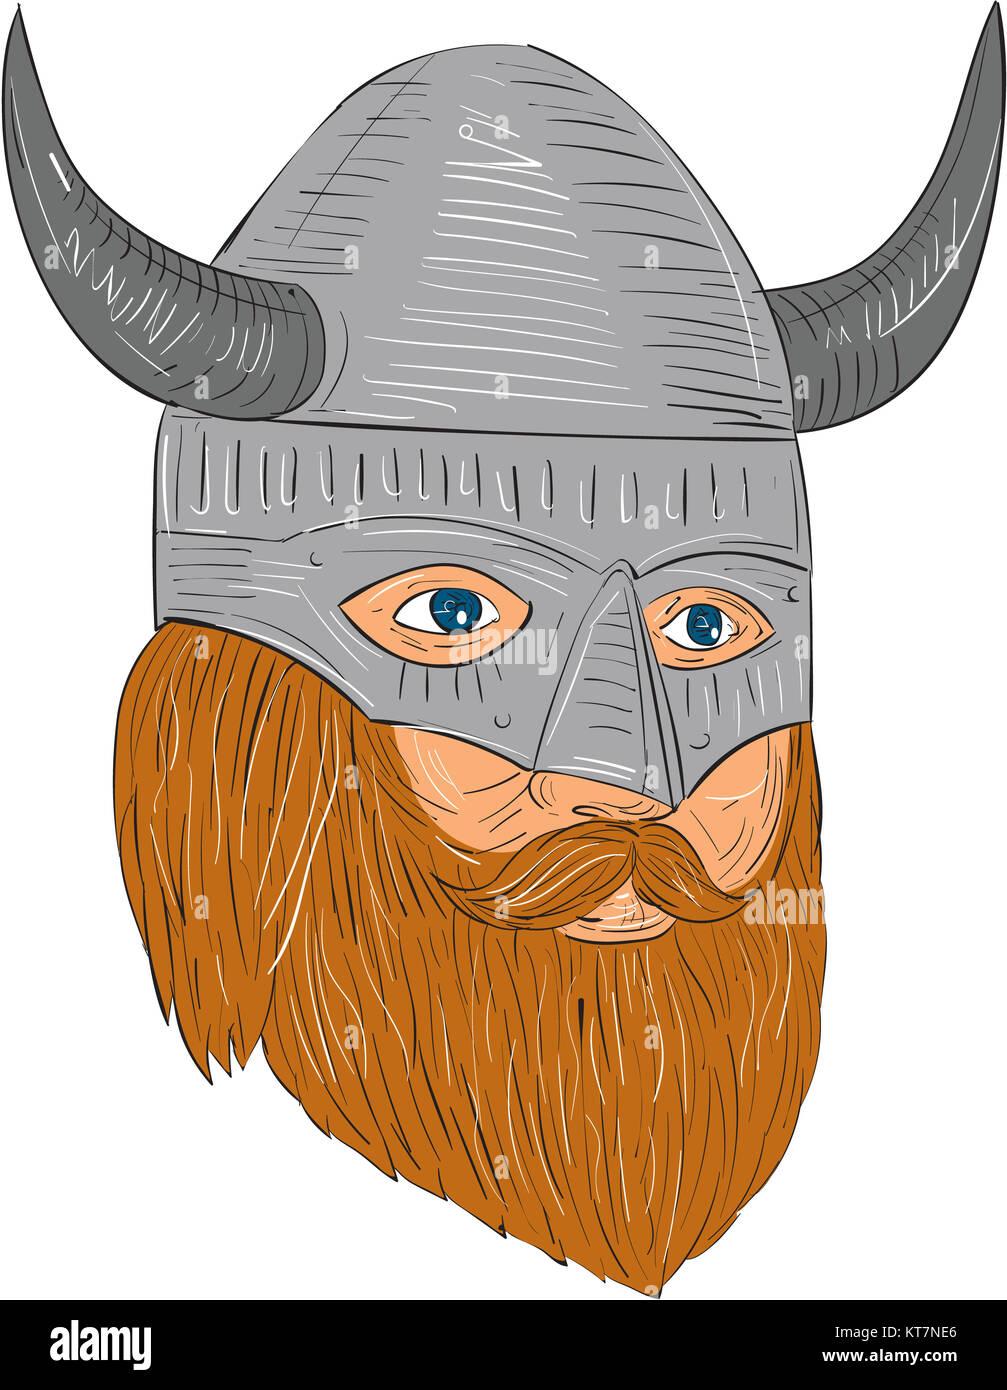 Viking Warrior Drawing Stock Photos & Viking Warrior ...